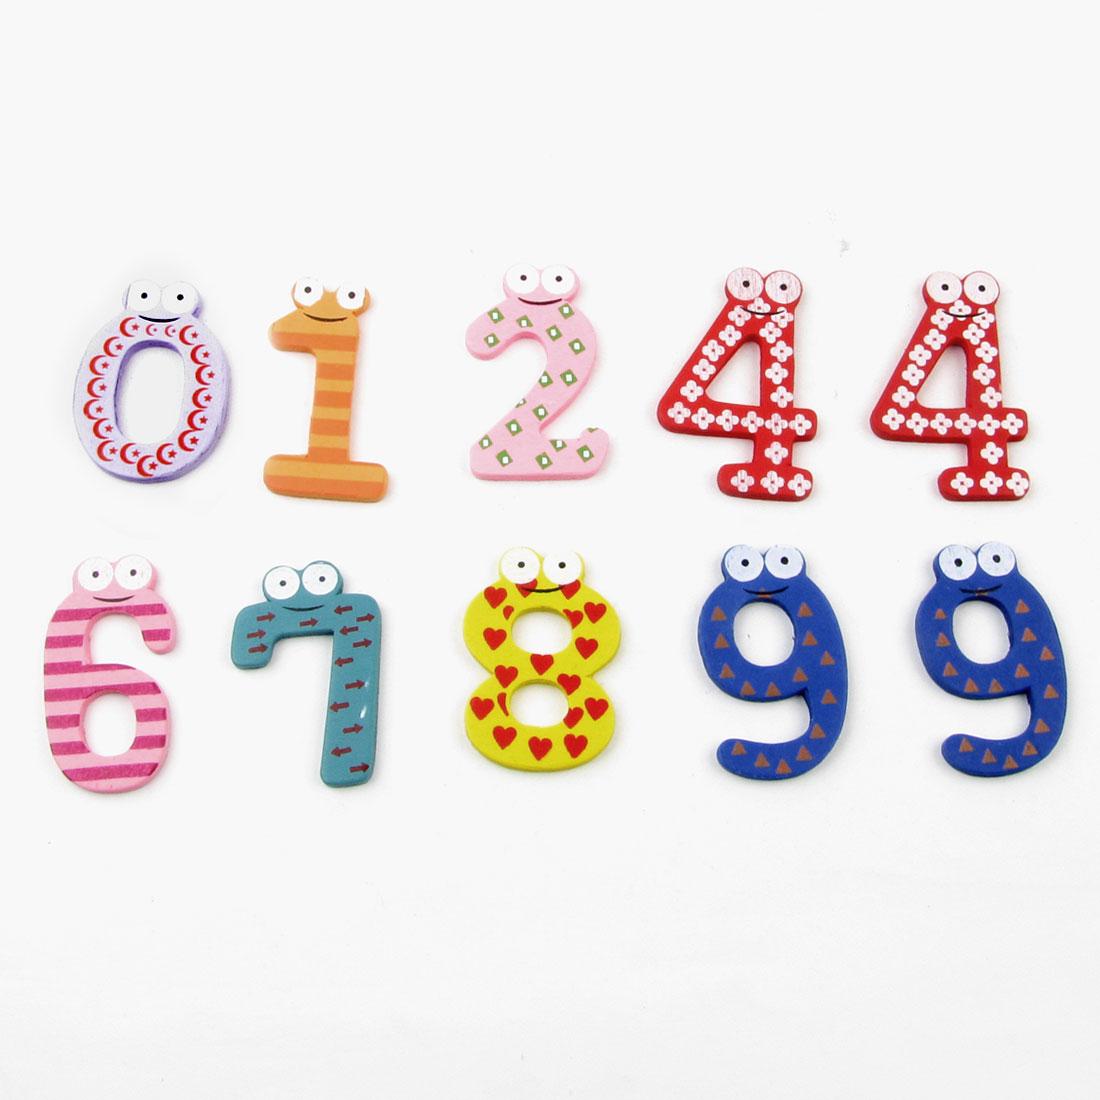 Fridge Refrigerator Ornament Wooden Number Type Magnet Sticker Multicolor 10 Pcs